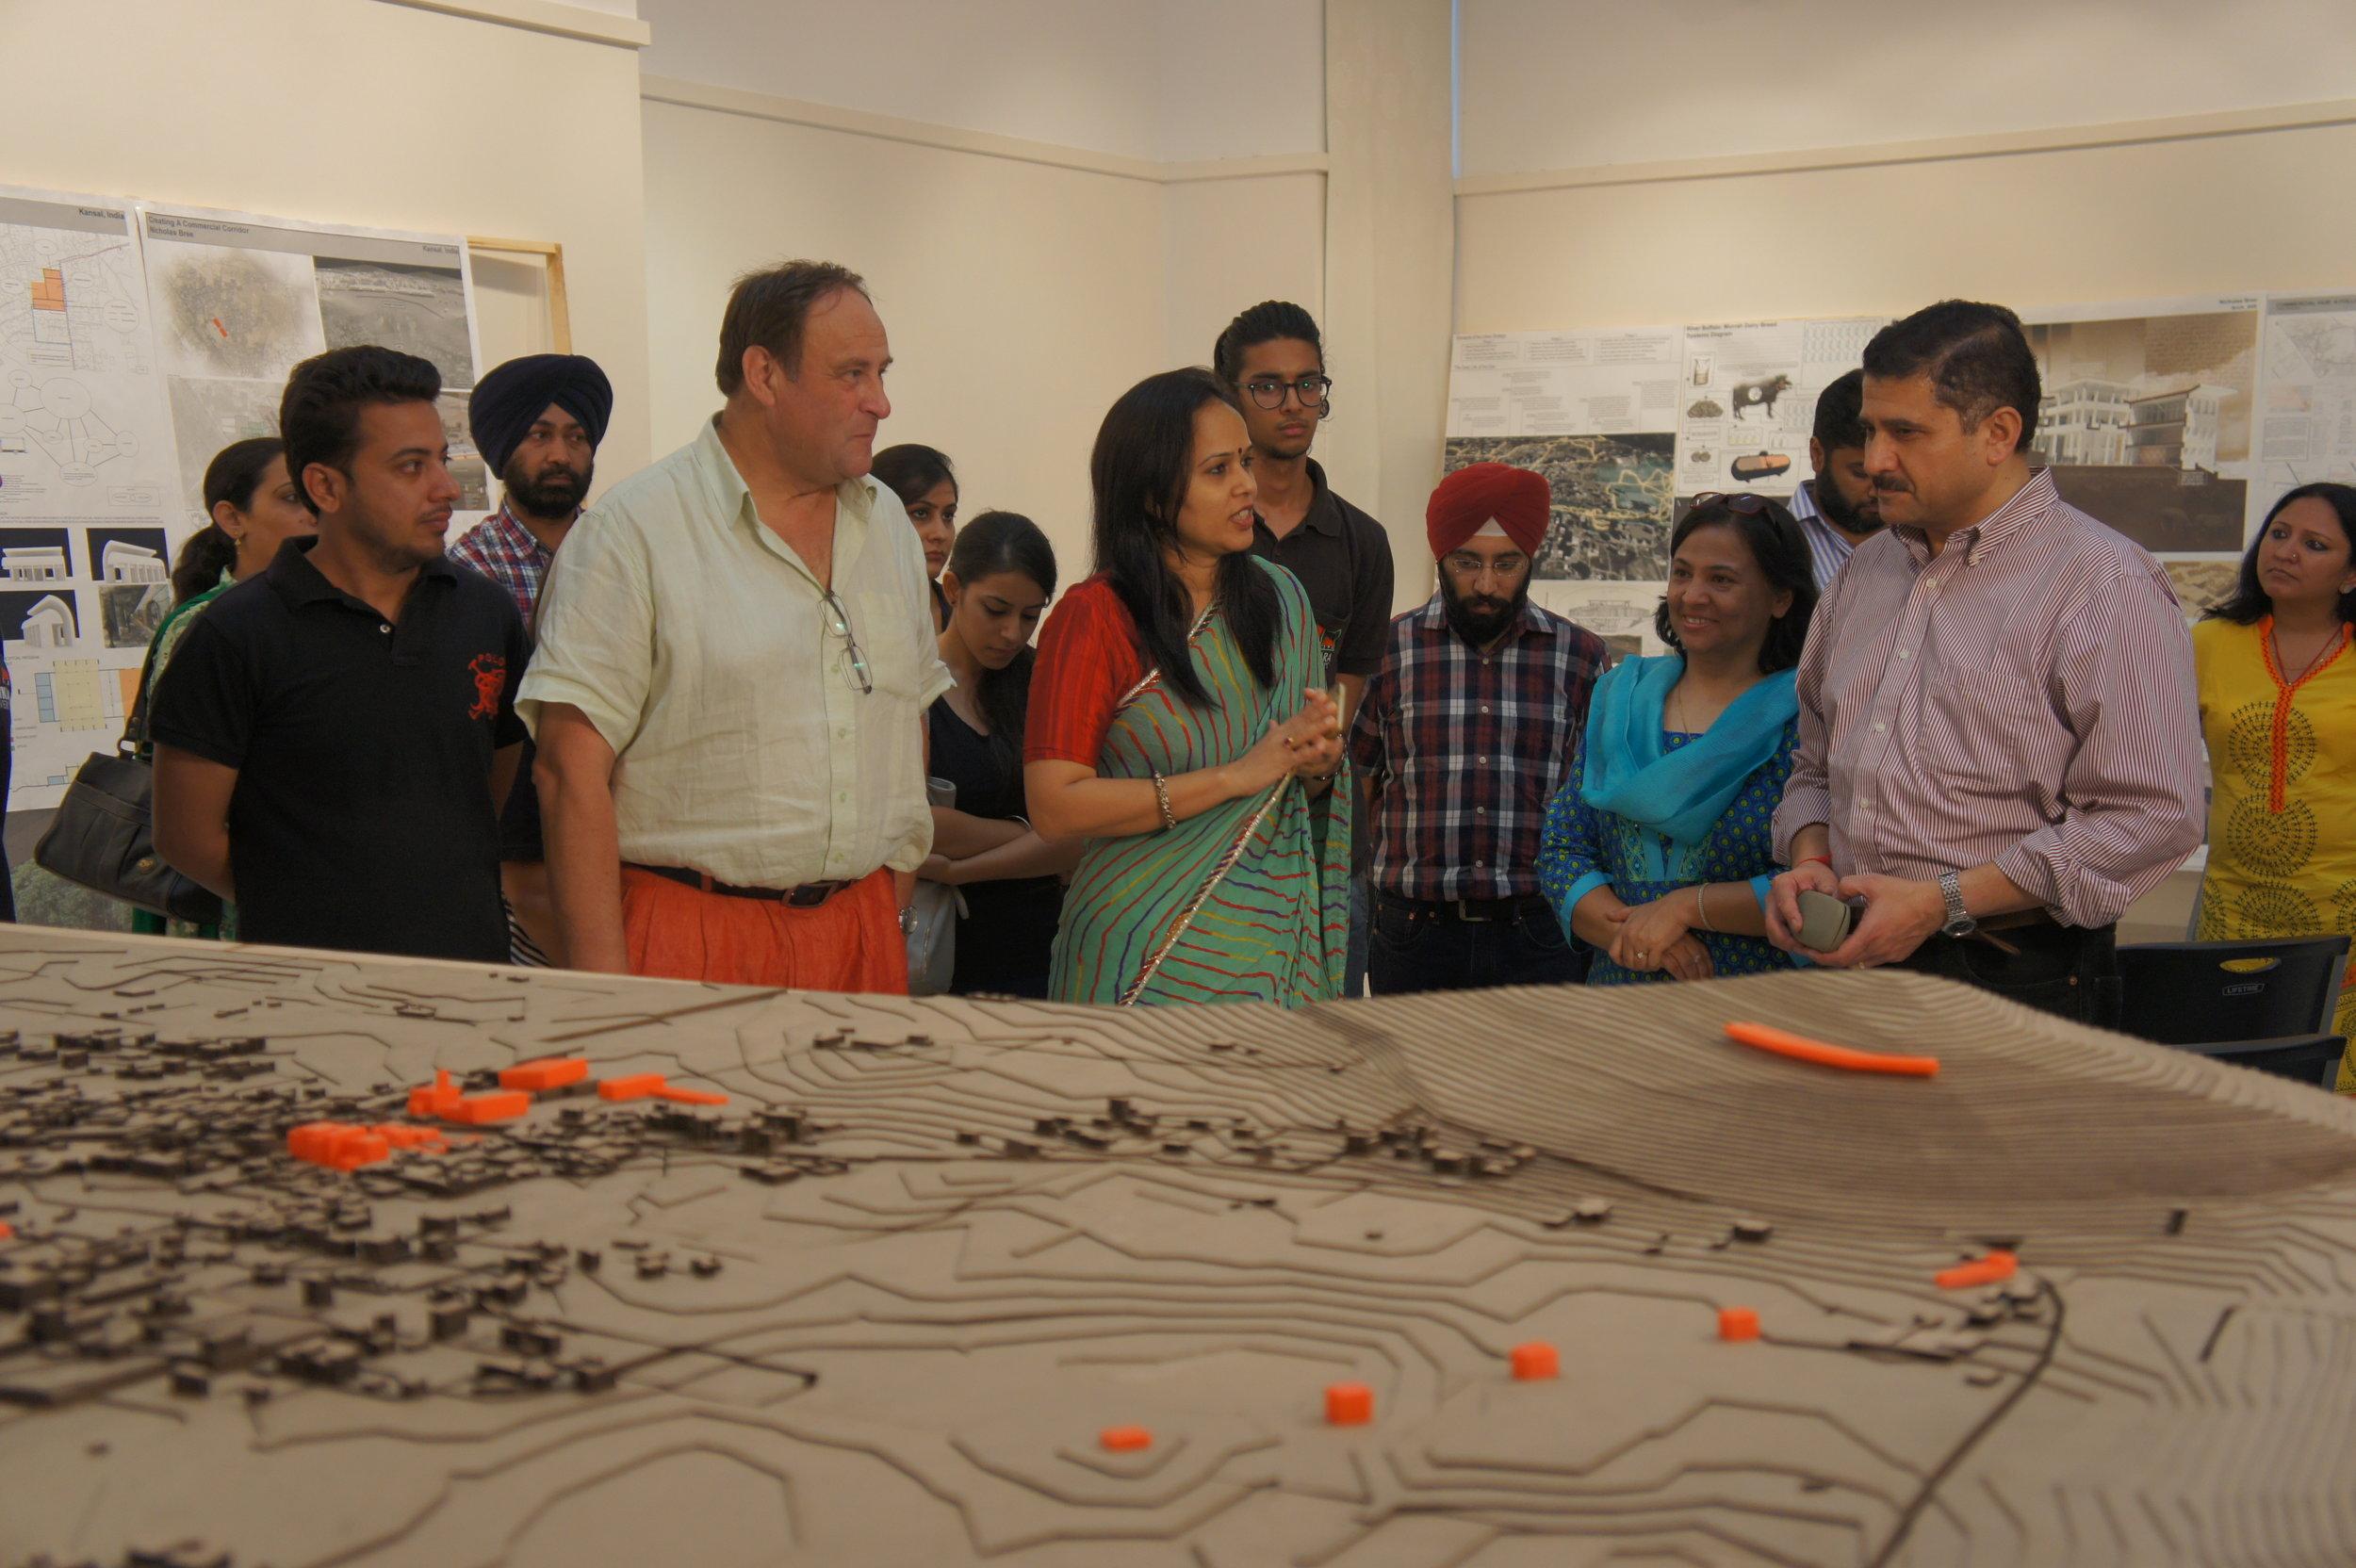 Urban Edge Chandigarh Exhibit 3 - 2015.JPG